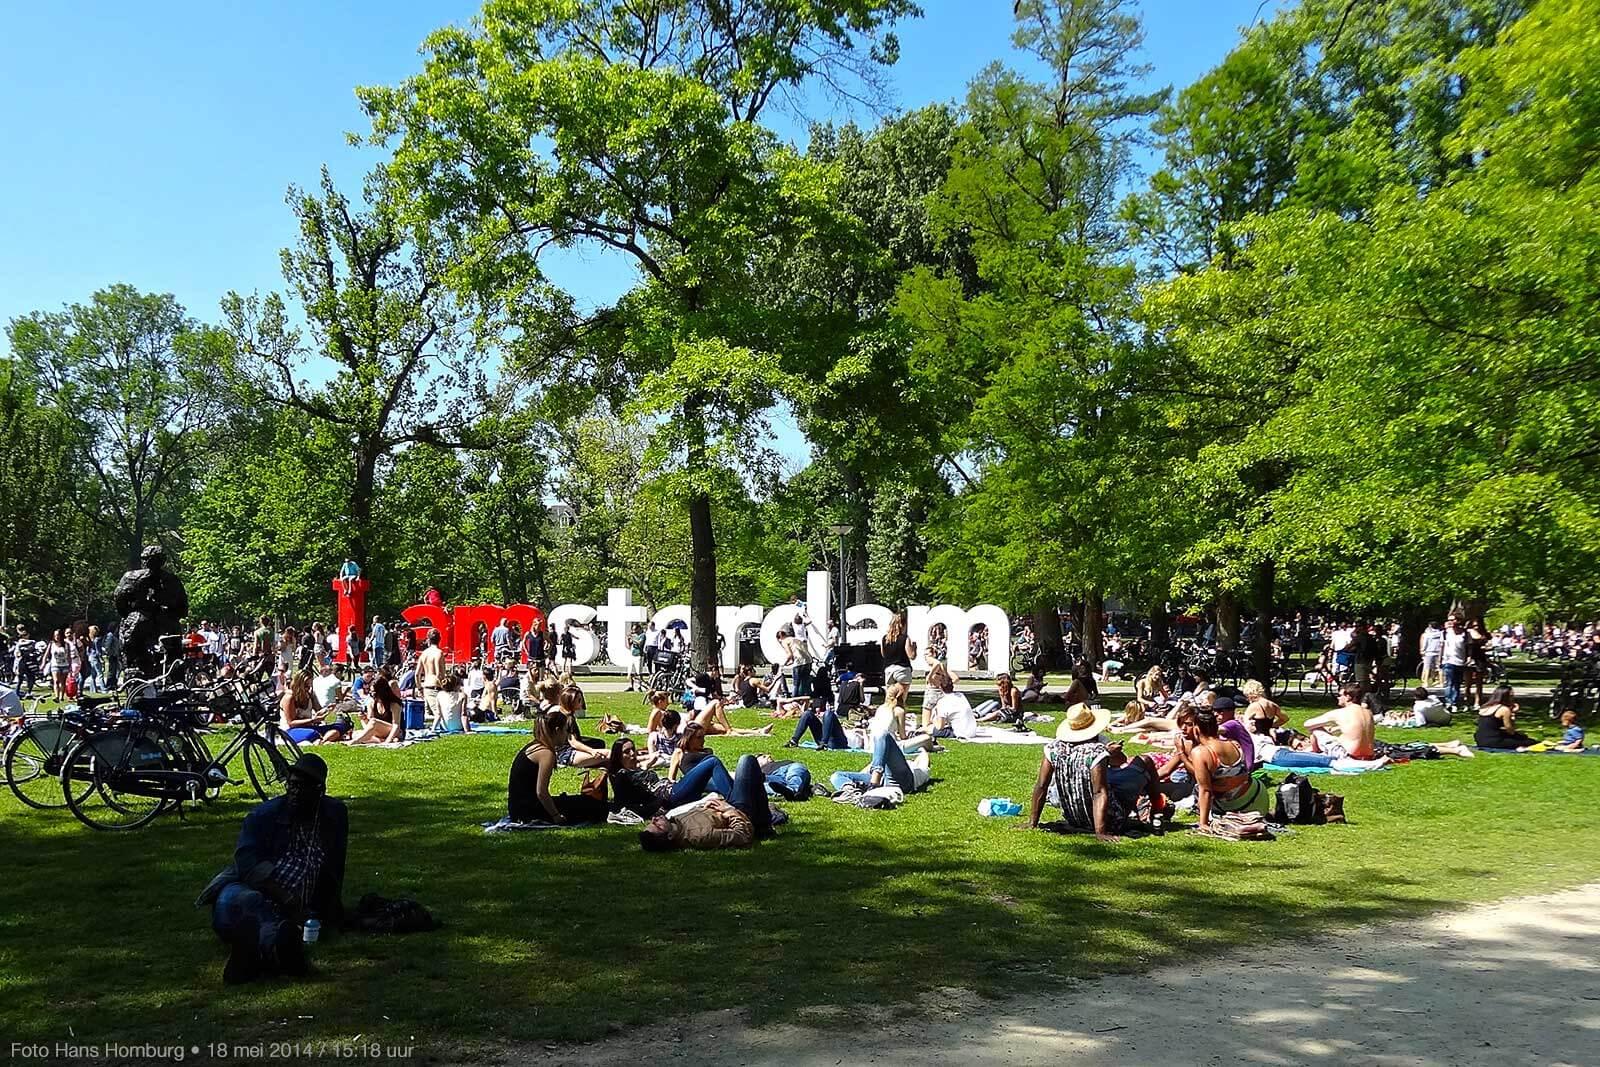 Citaten Zomer Dj 2017 : Zomer fun top uitjes in augustus stichting prisma